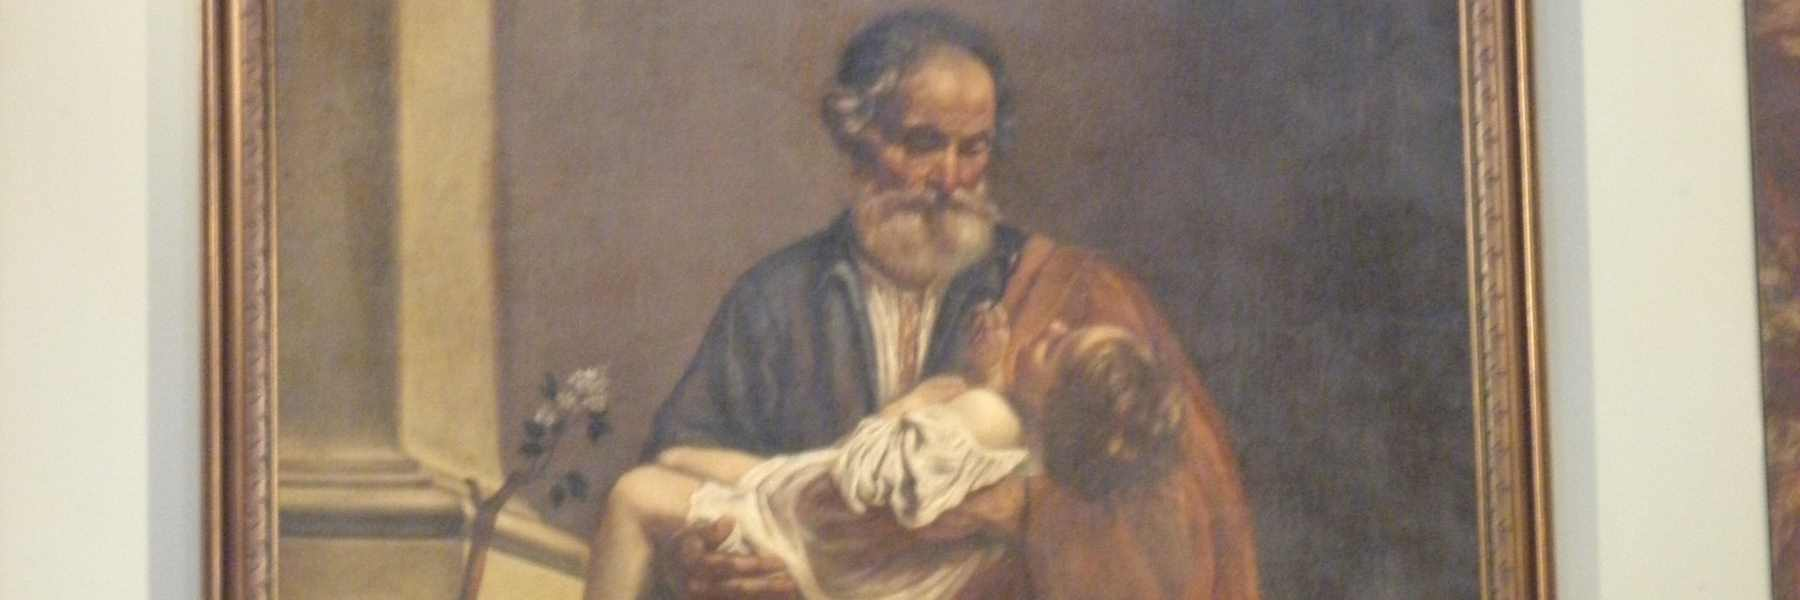 The Painting of Saint Joseph